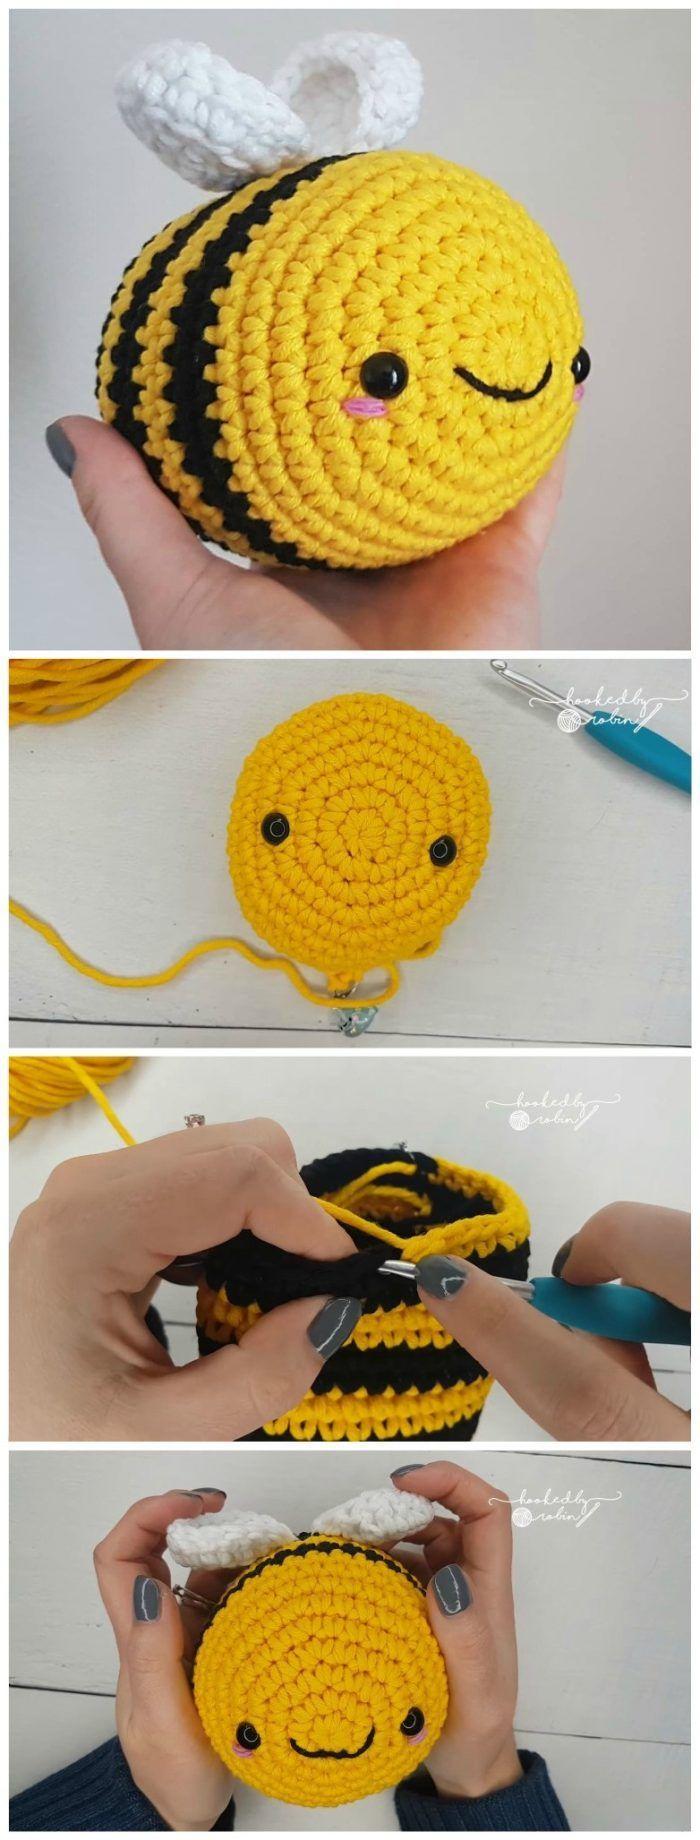 Amigurumi Bumblebee Free Häkelanleitung - Diy Projekt #crochetanimalamigurumi